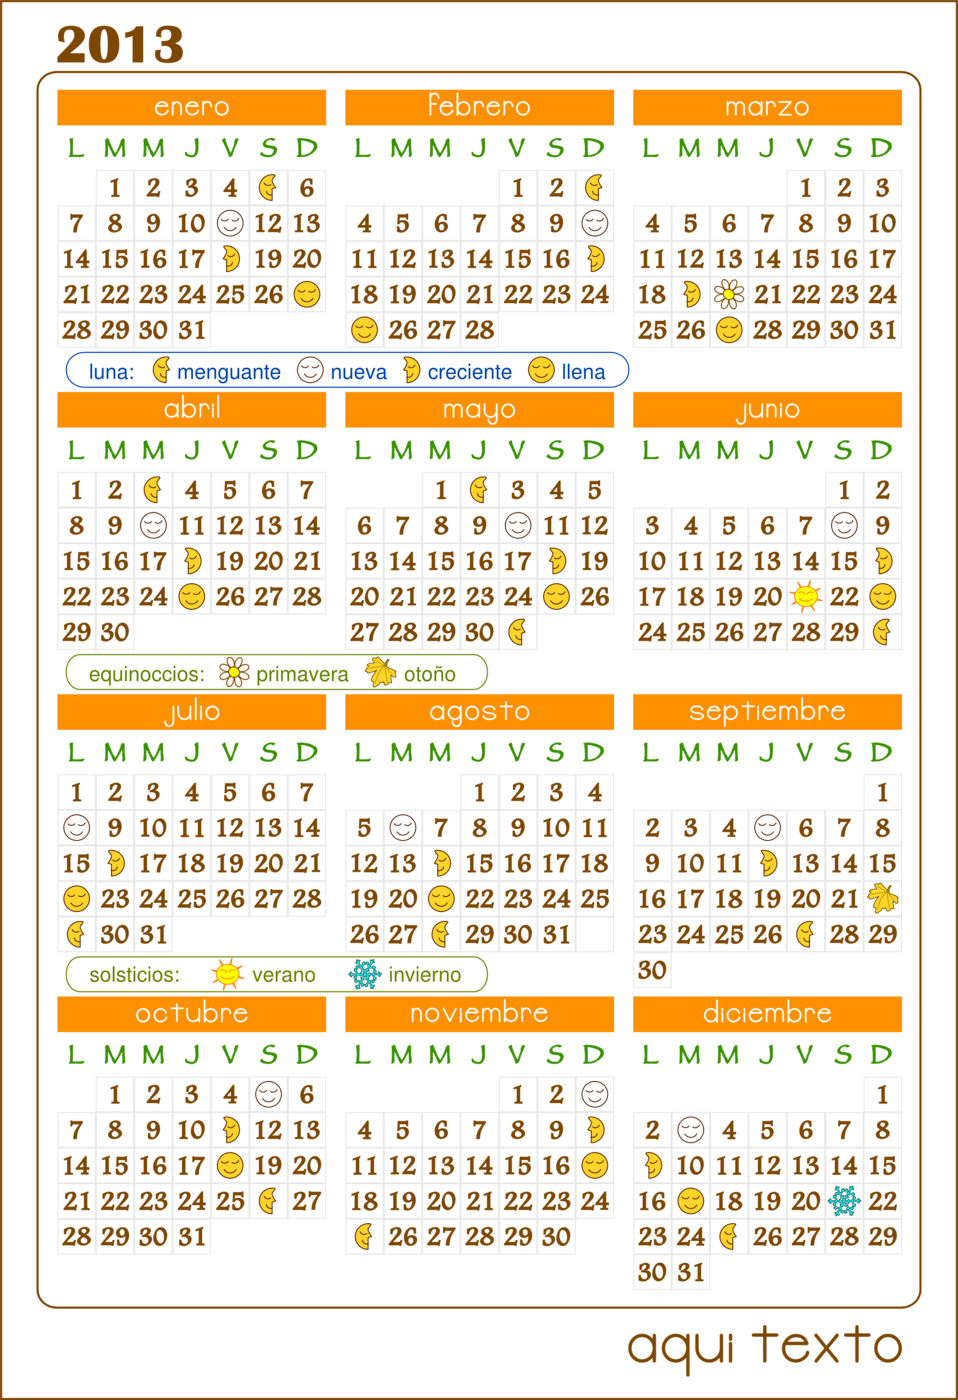 Calendario 2013 Calendar v.1